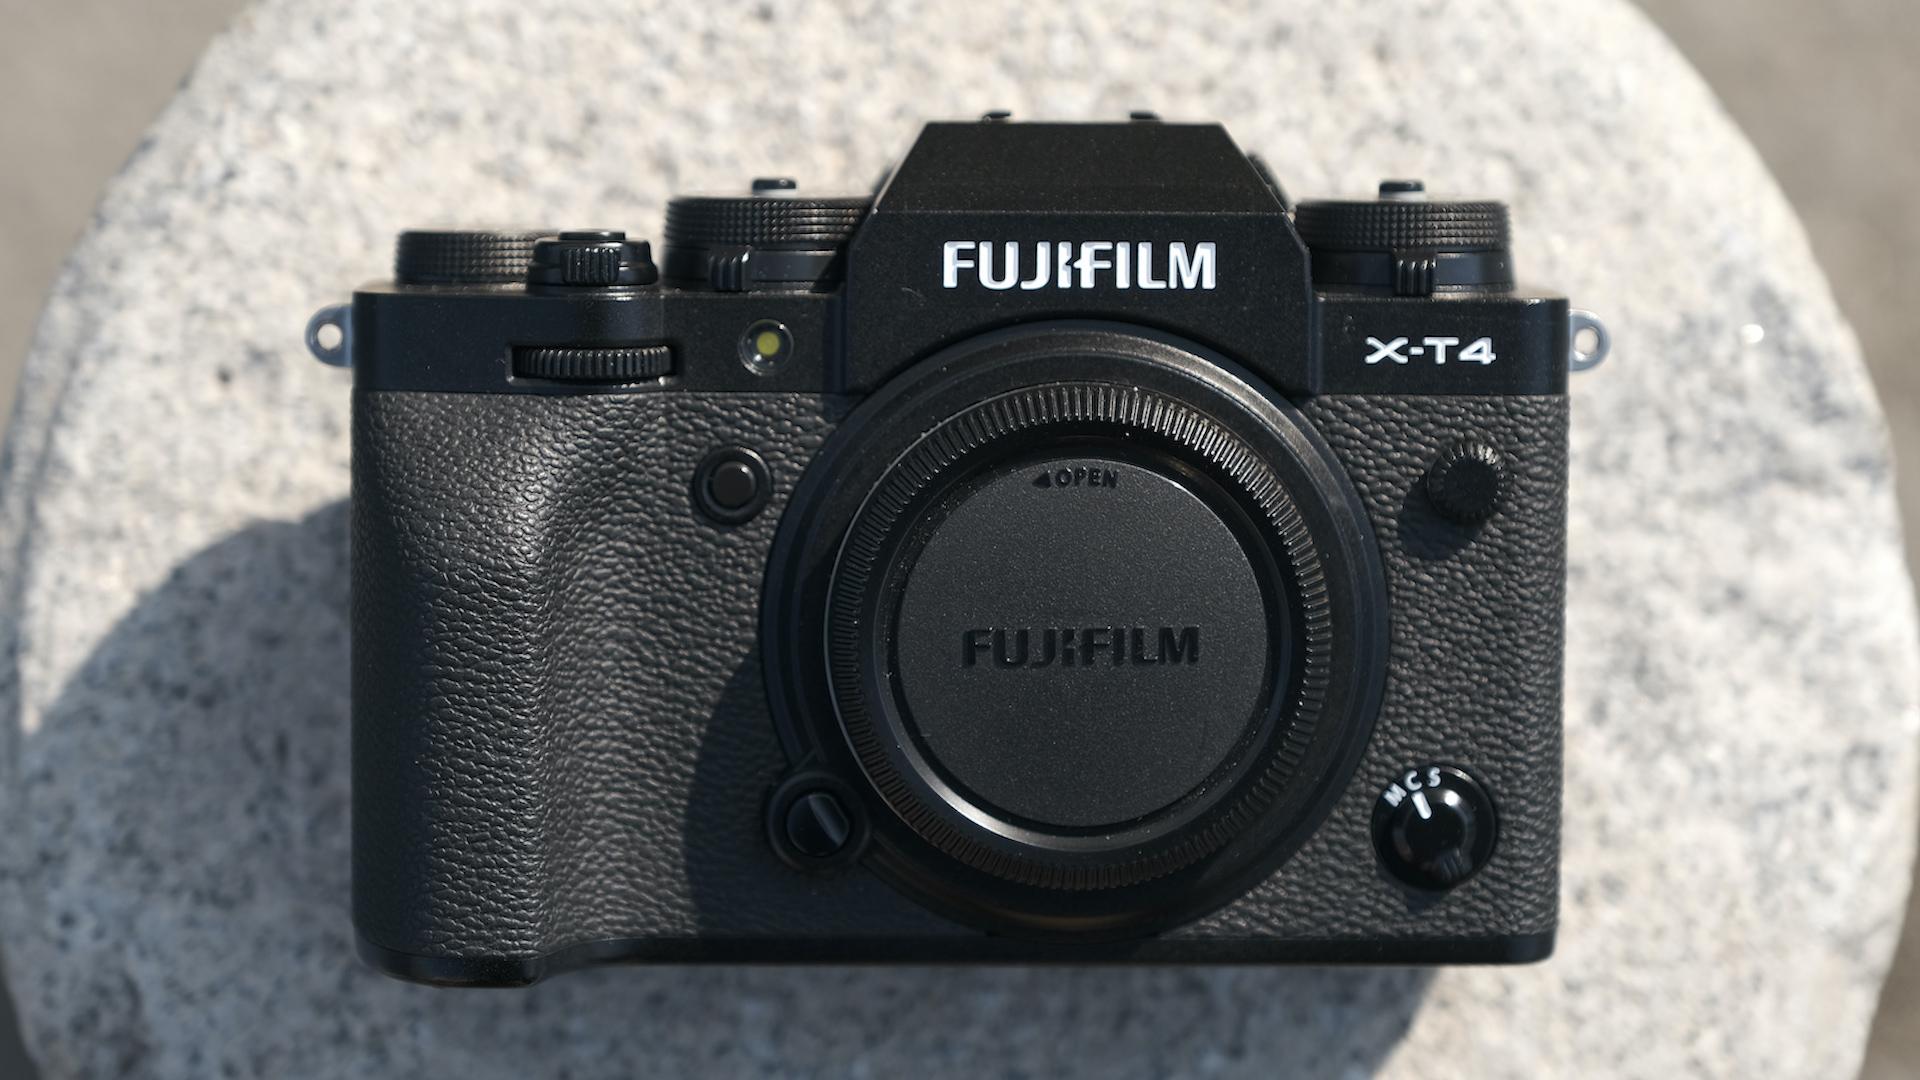 FUJIFILM X-T4 Firmware Update Released – Brings Improvement of IBIS Function in Movie Mode